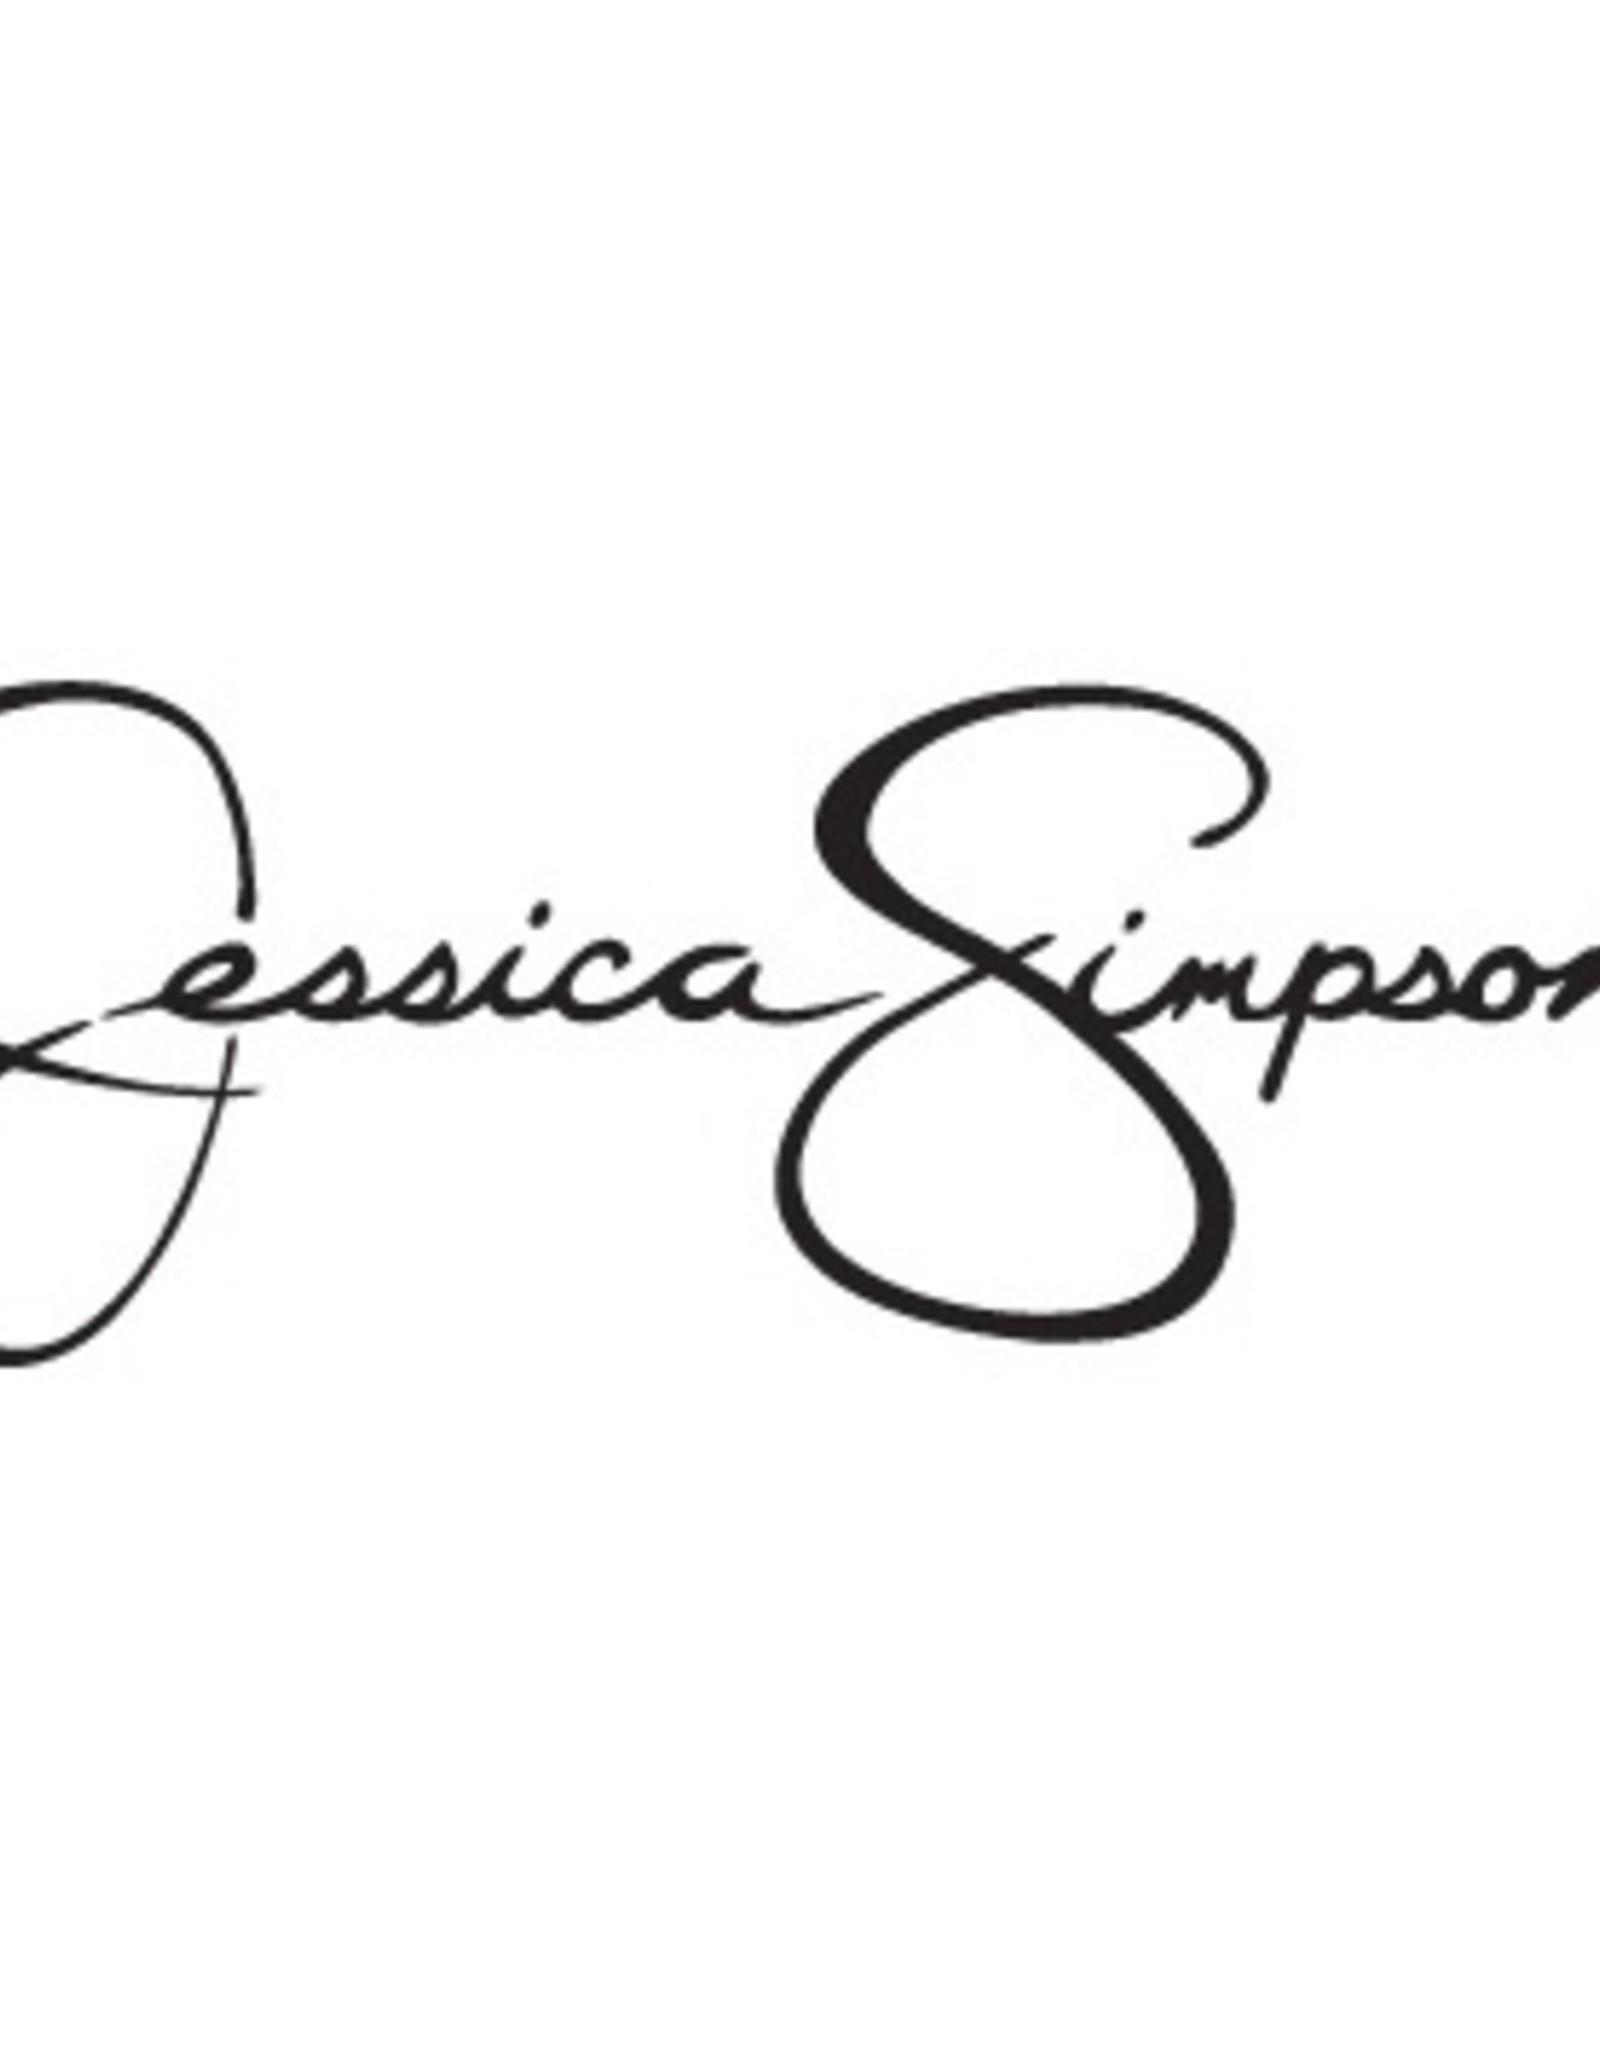 Peking Handcraft Shower Curtain - Lola Jessica Simpson